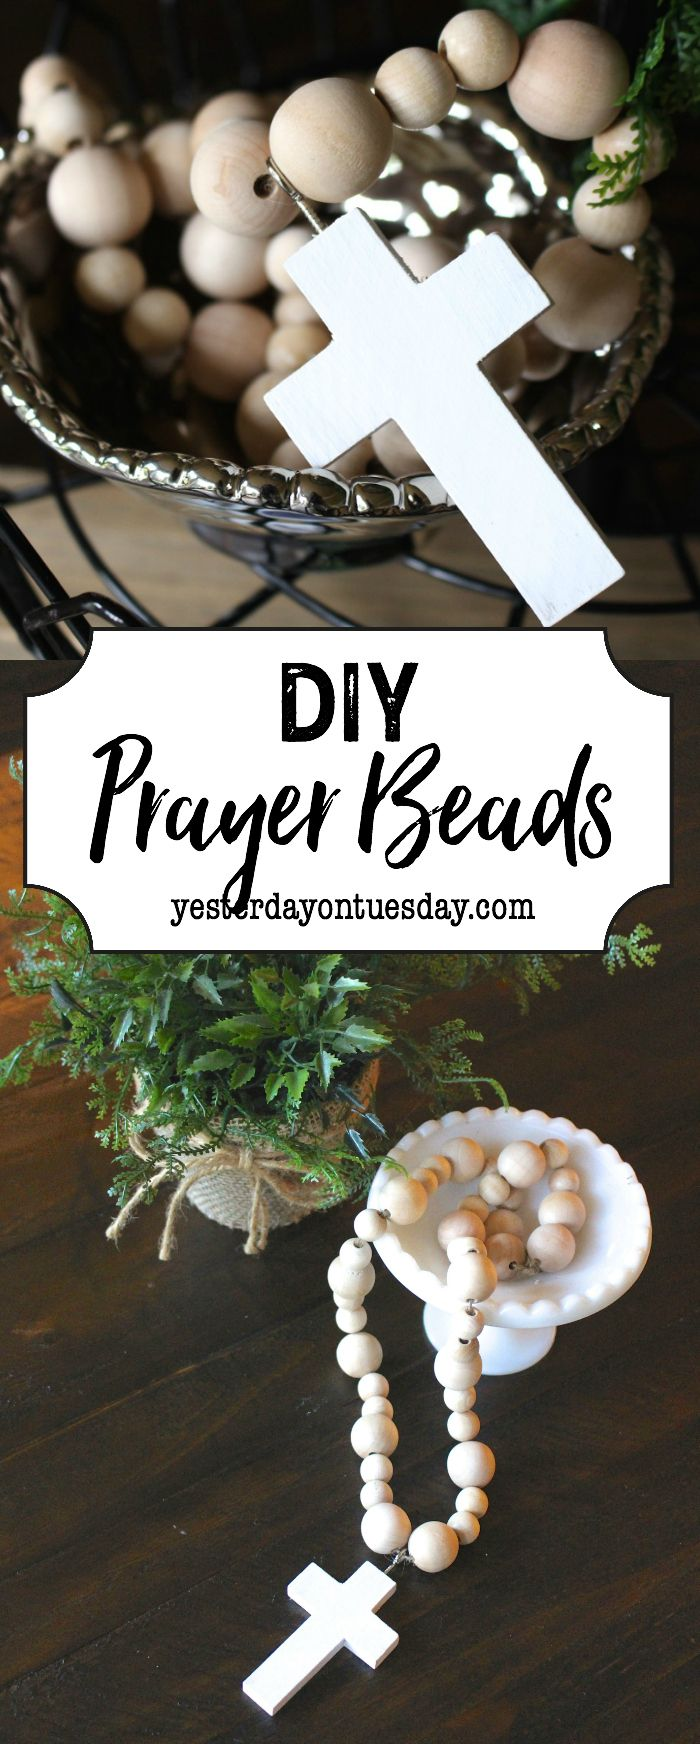 DIY Prayer Beads: How to make your own modern farmhouse style prayer beads. An e...